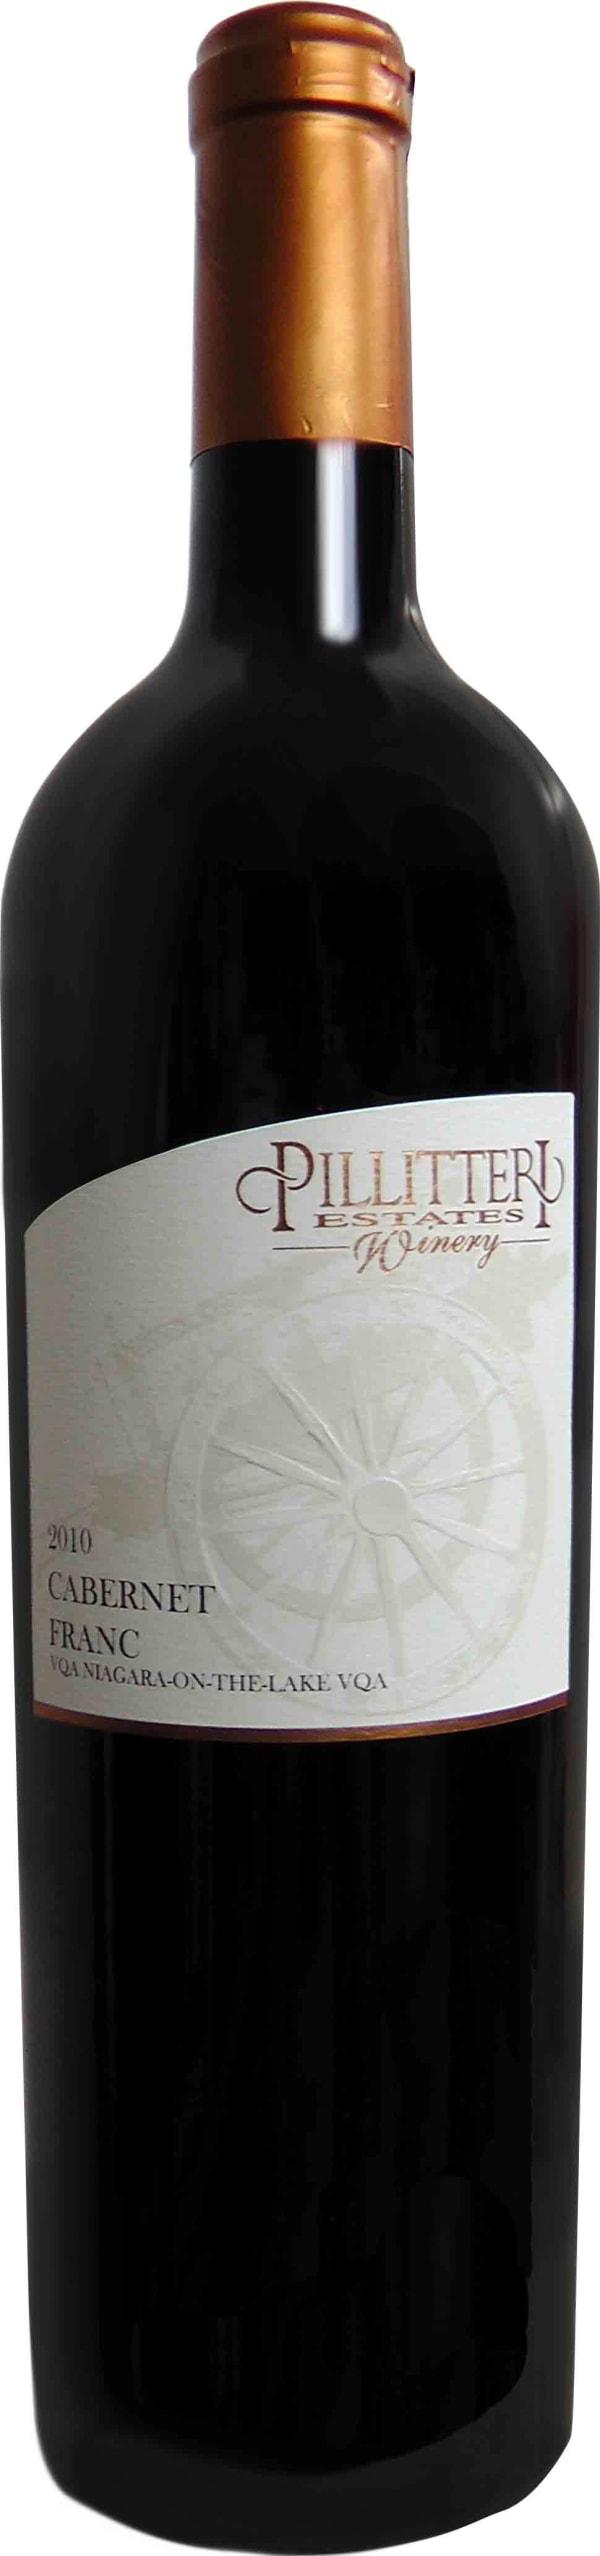 Pillitteri Cabernet Franc 2010